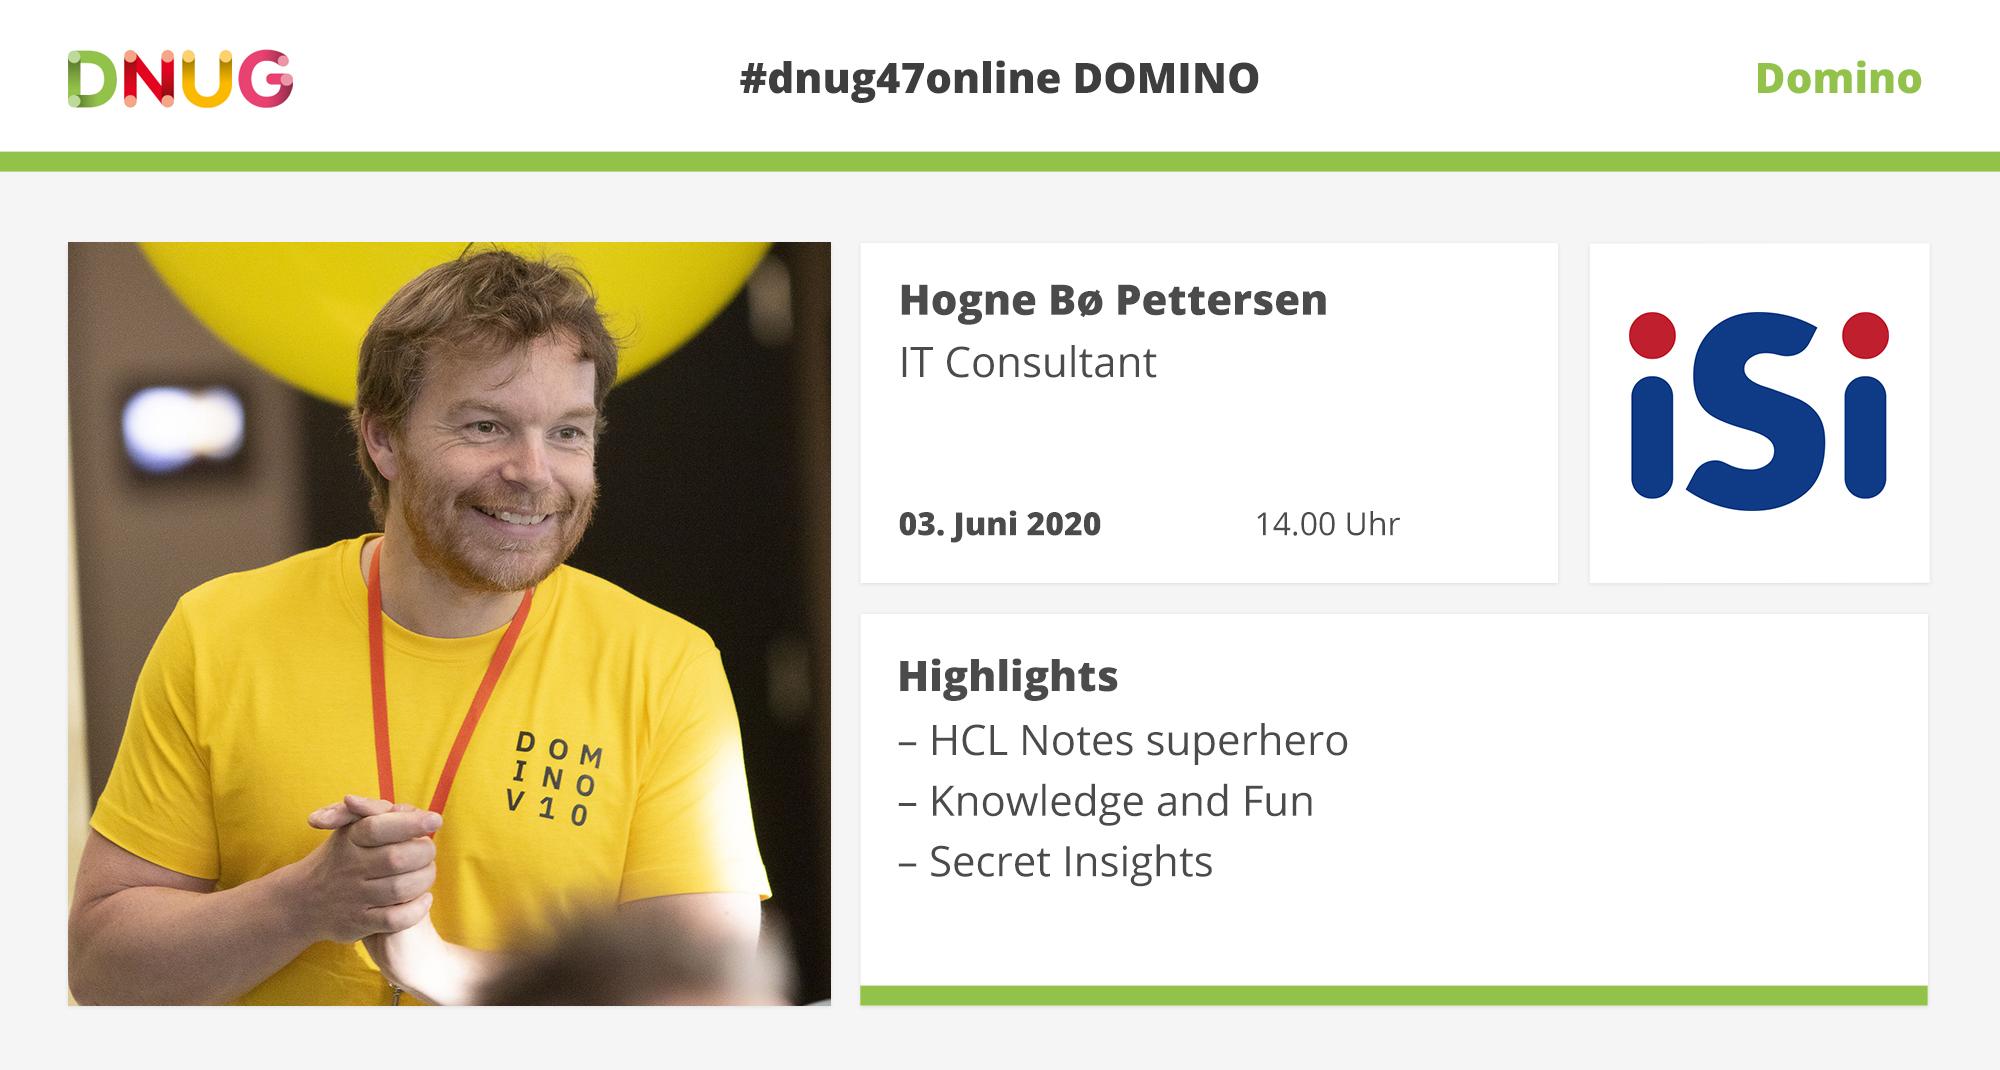 Hogne B. Pettersen at DNUG#47Online